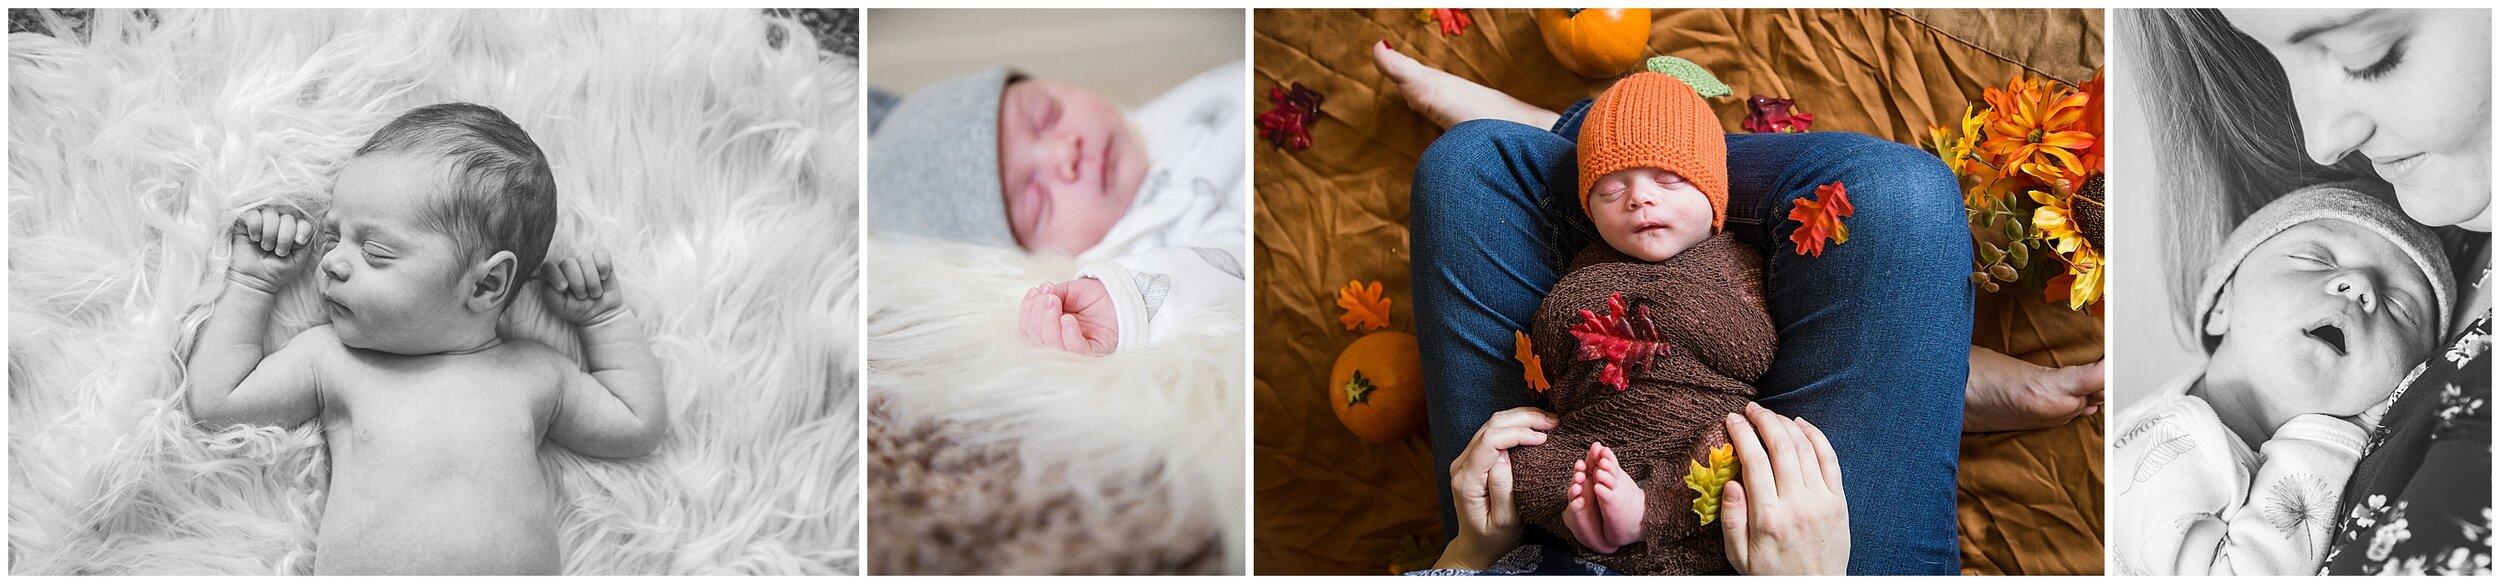 baby leiff newborn photography_0015.jpg